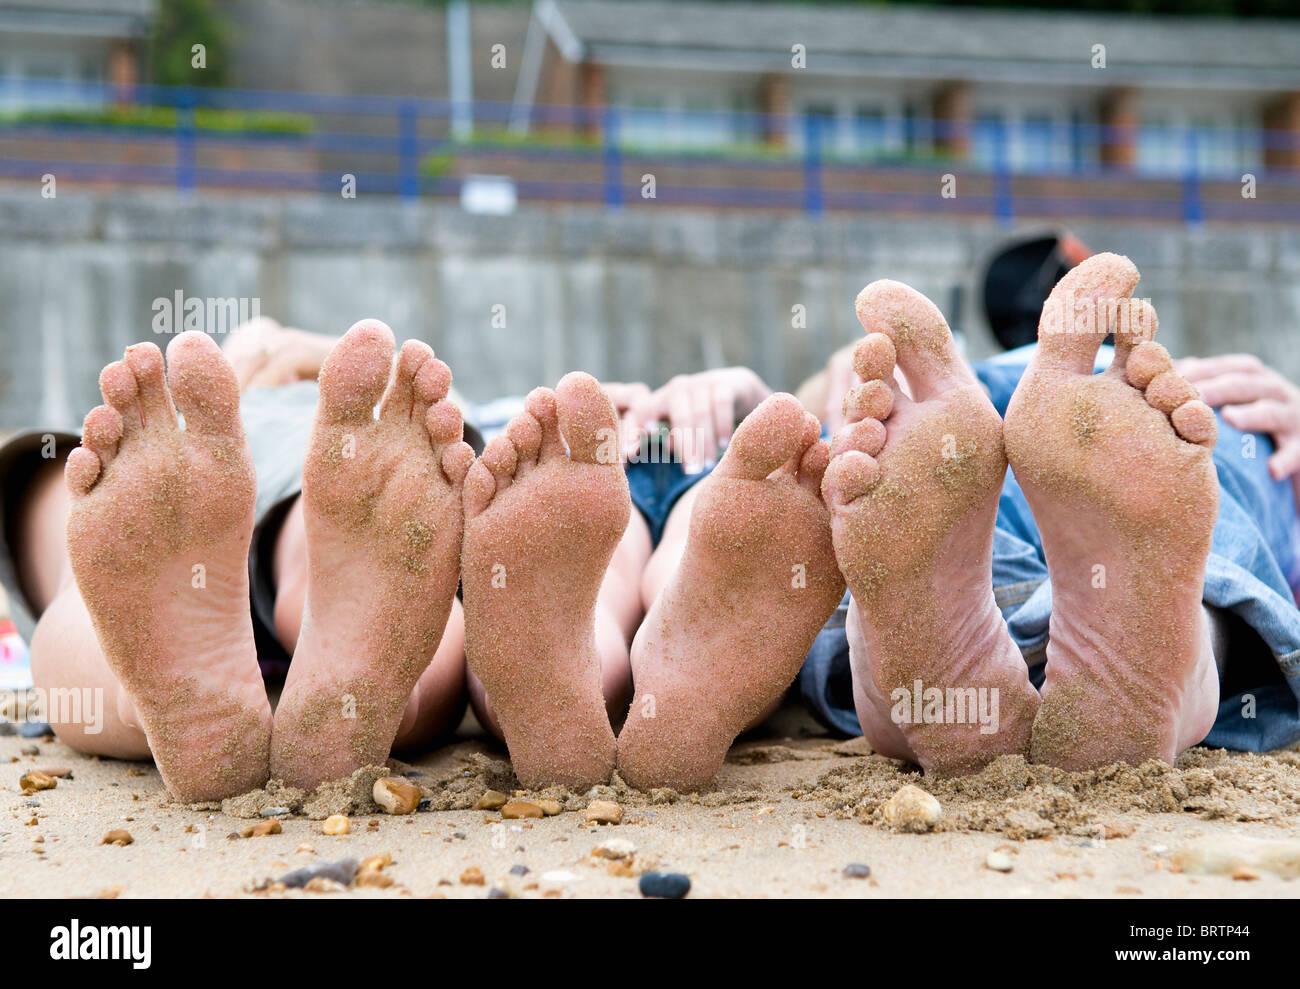 Families sandy feet on beach - Stock Image